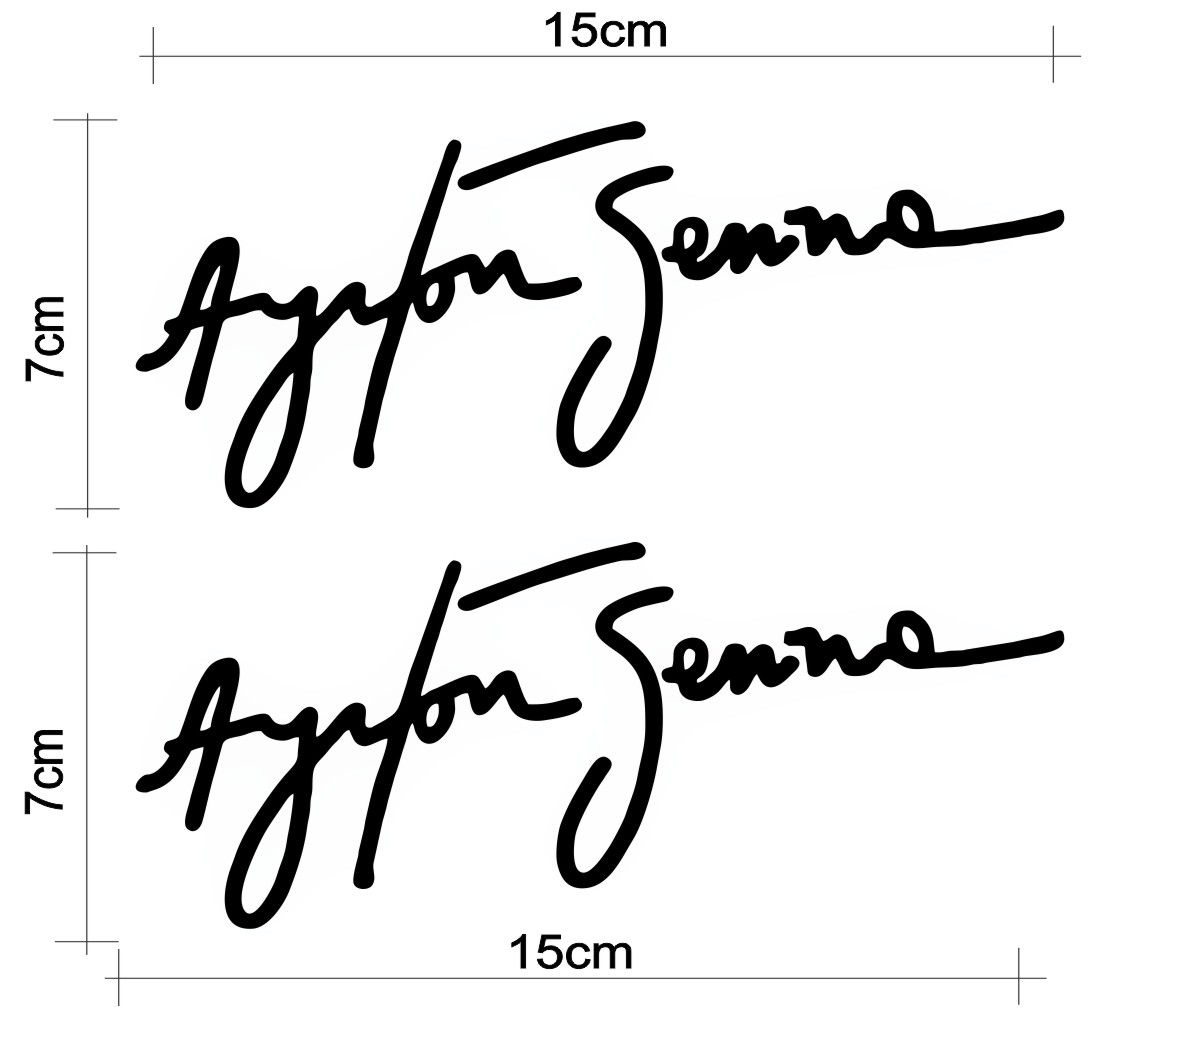 2 Adesivos Assinatura Ayrton Senna - Várias cores - Qualidade TOP